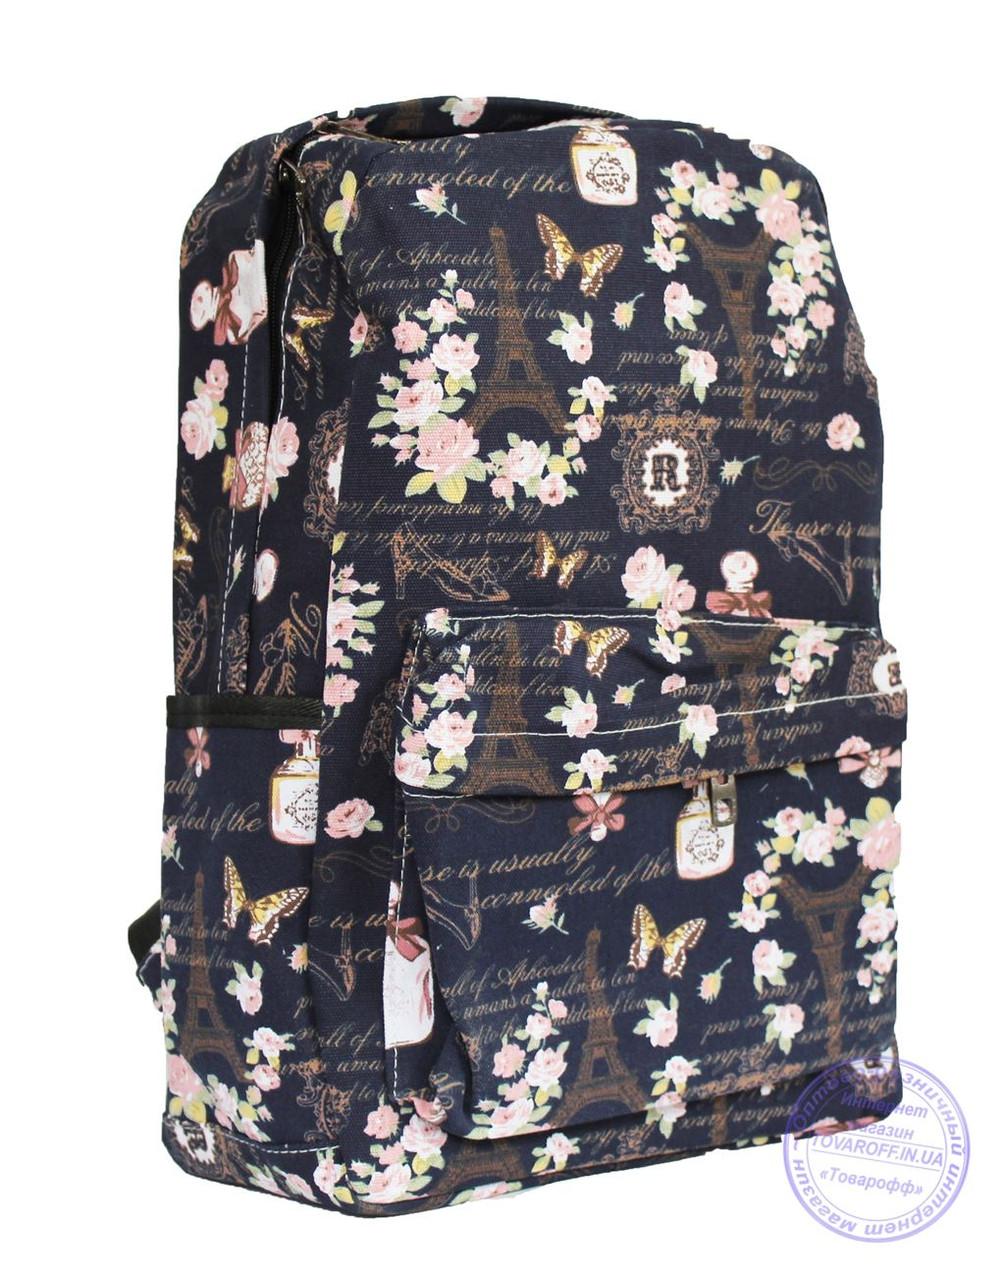 Тканевый рюкзак для девочки - синий - 7145